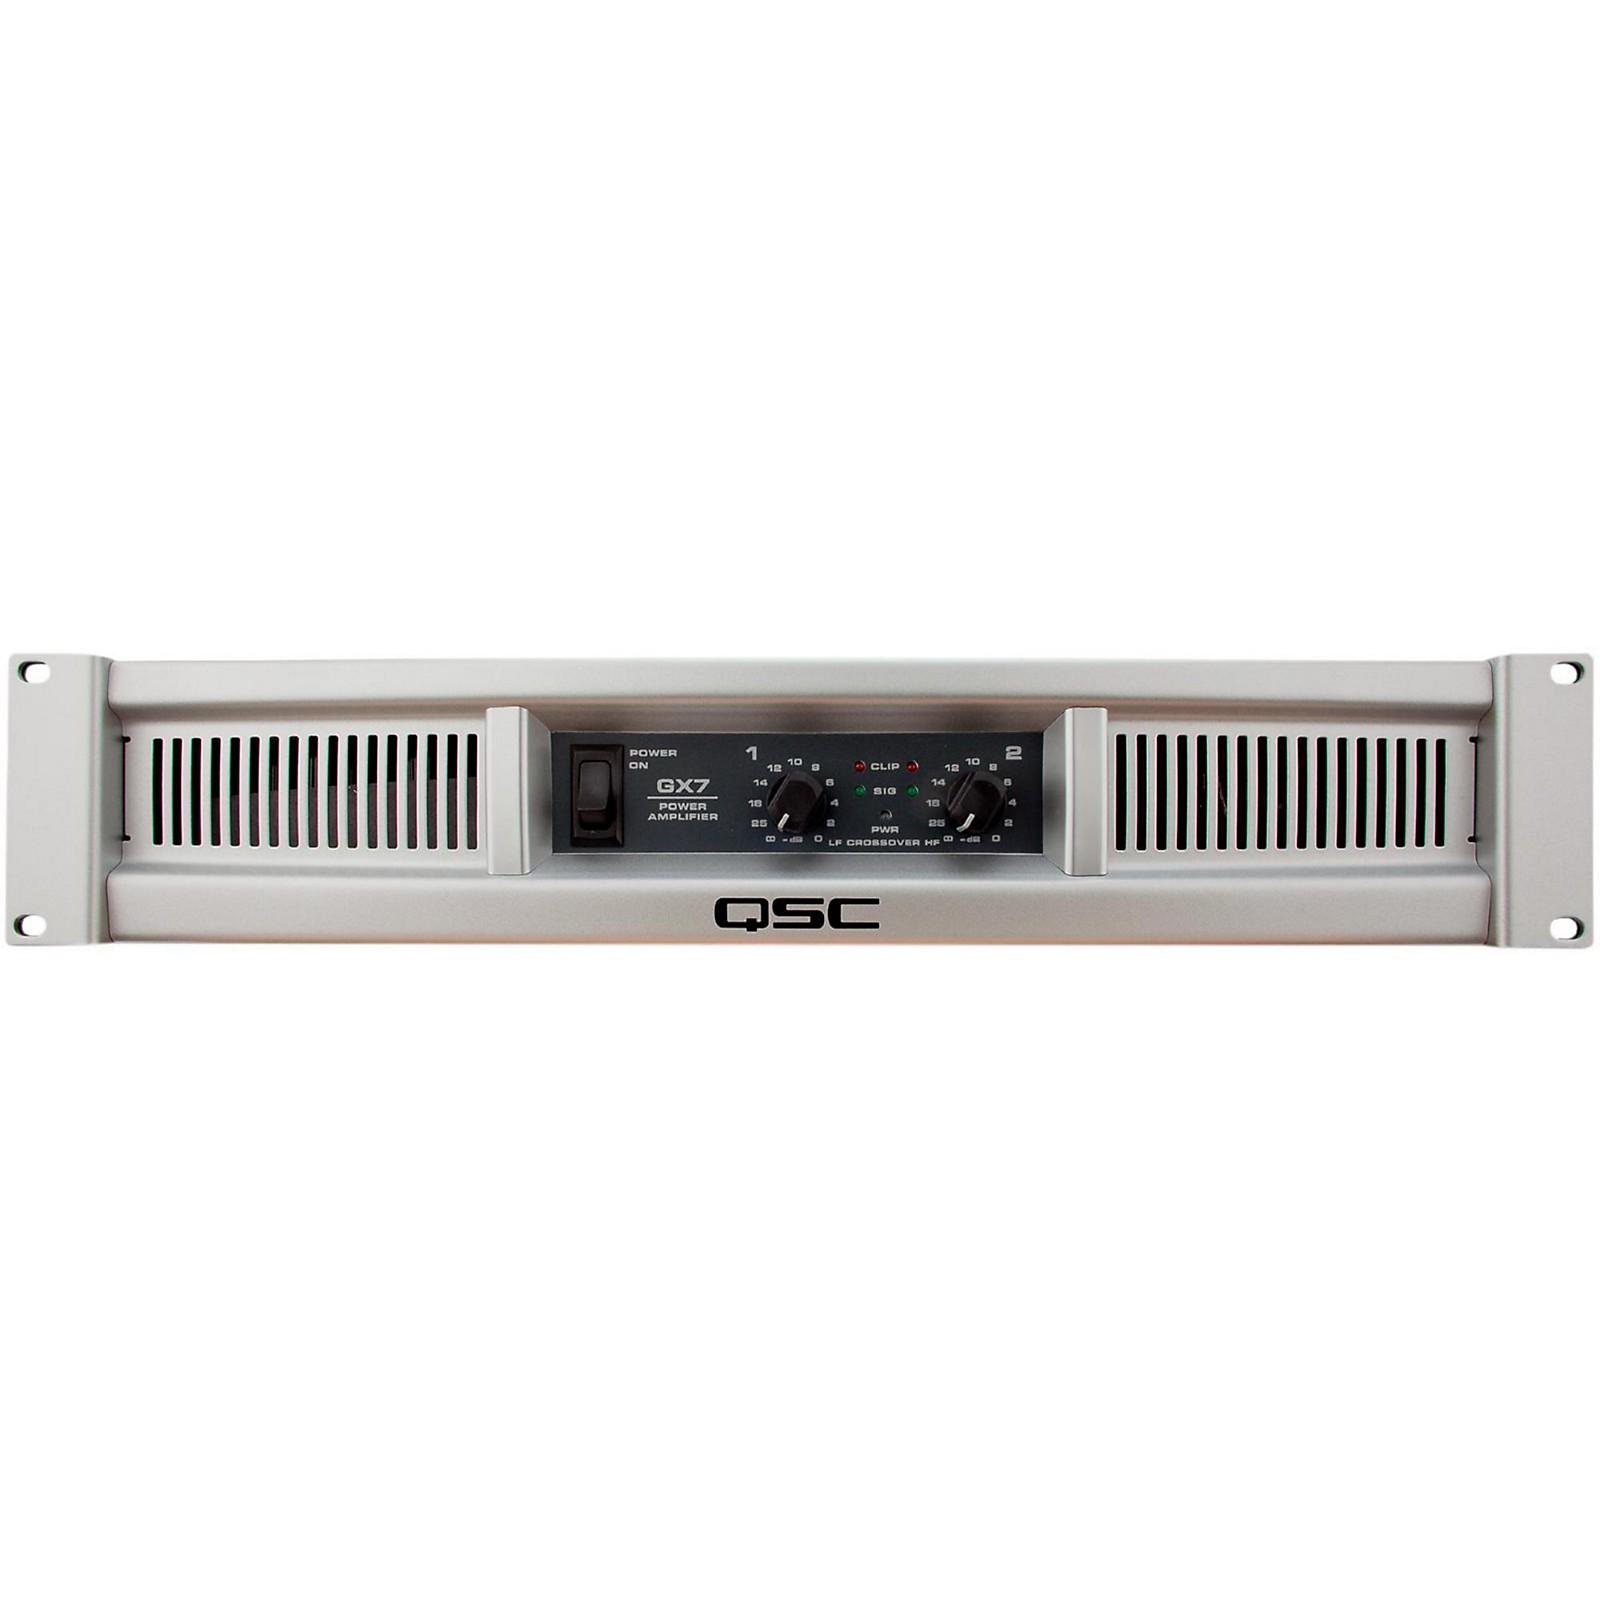 QSC GX7 Stereo Power Amplifier